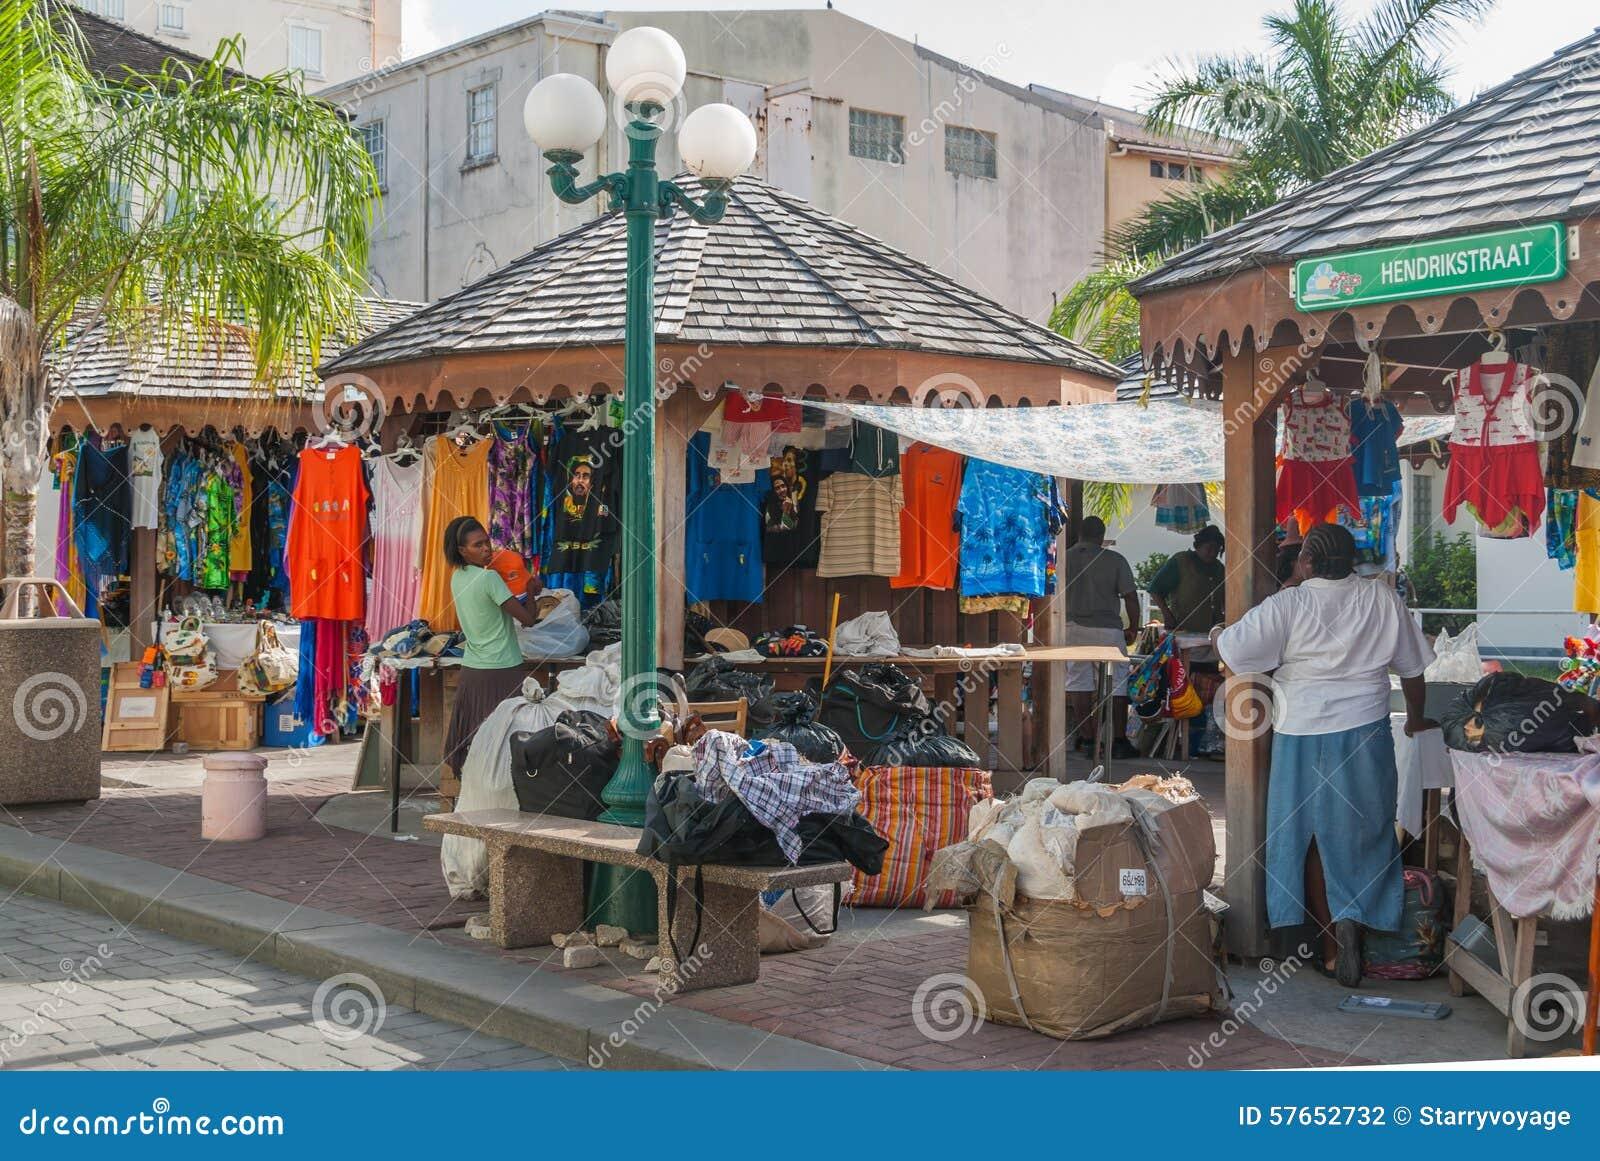 Mormon In Martin Saint Caribbean Sex Shops